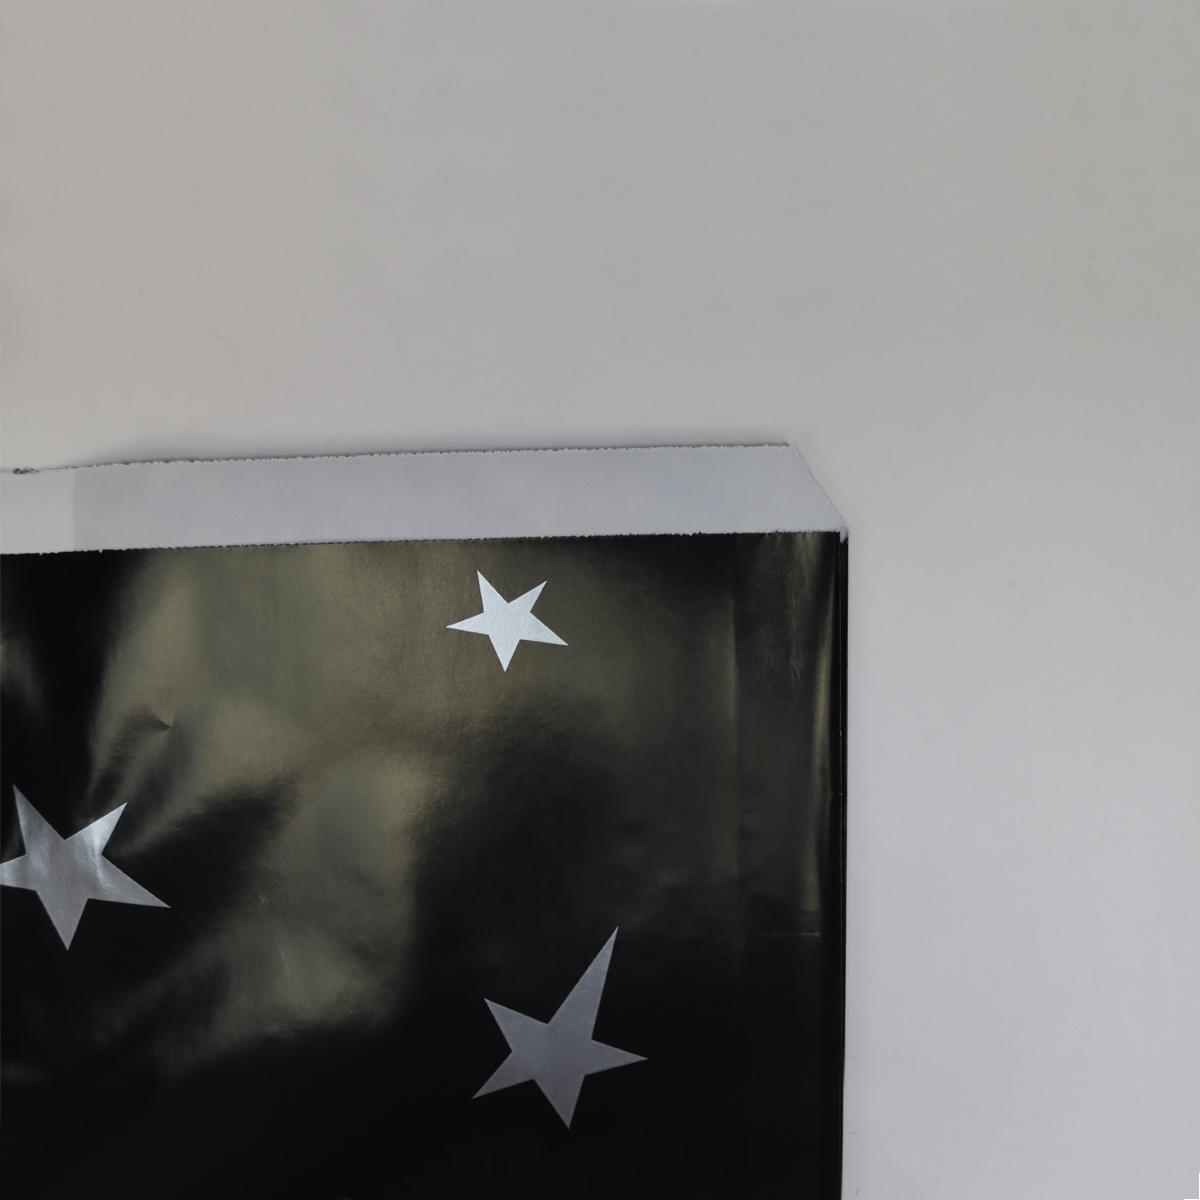 Fourniturenzakjes - Zwart met ster